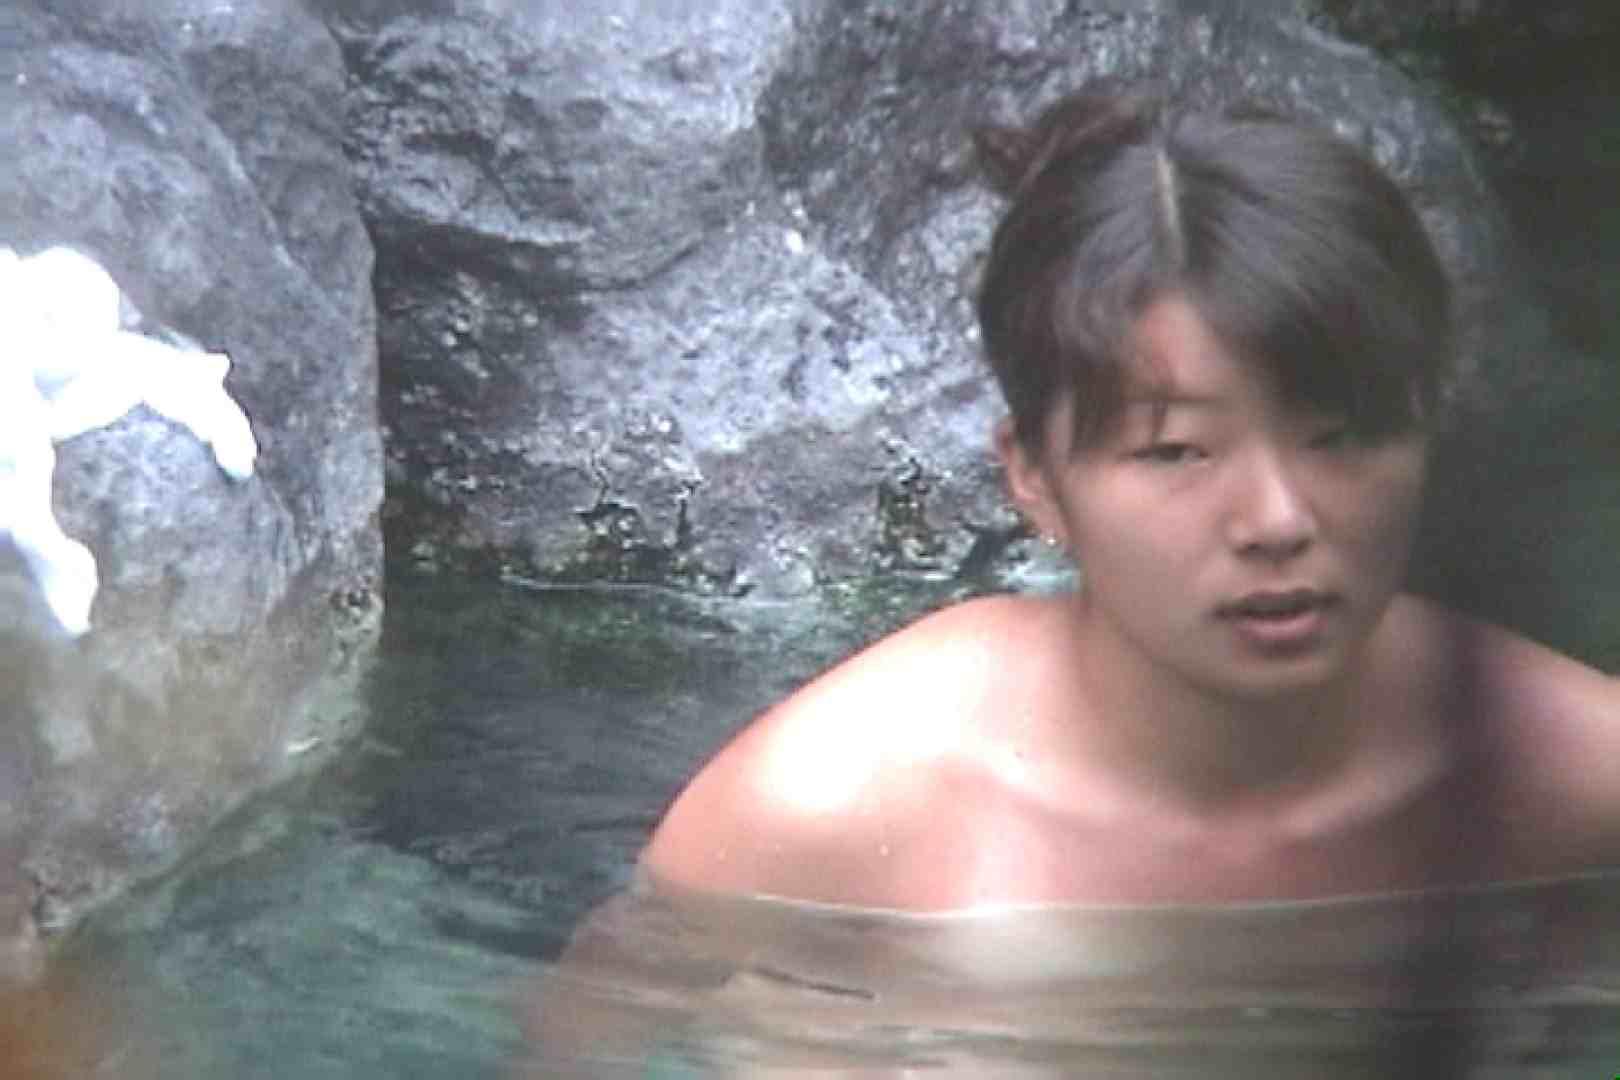 Aquaな露天風呂Vol.69【VIP限定】 盗撮 アダルト動画キャプチャ 106連発 68